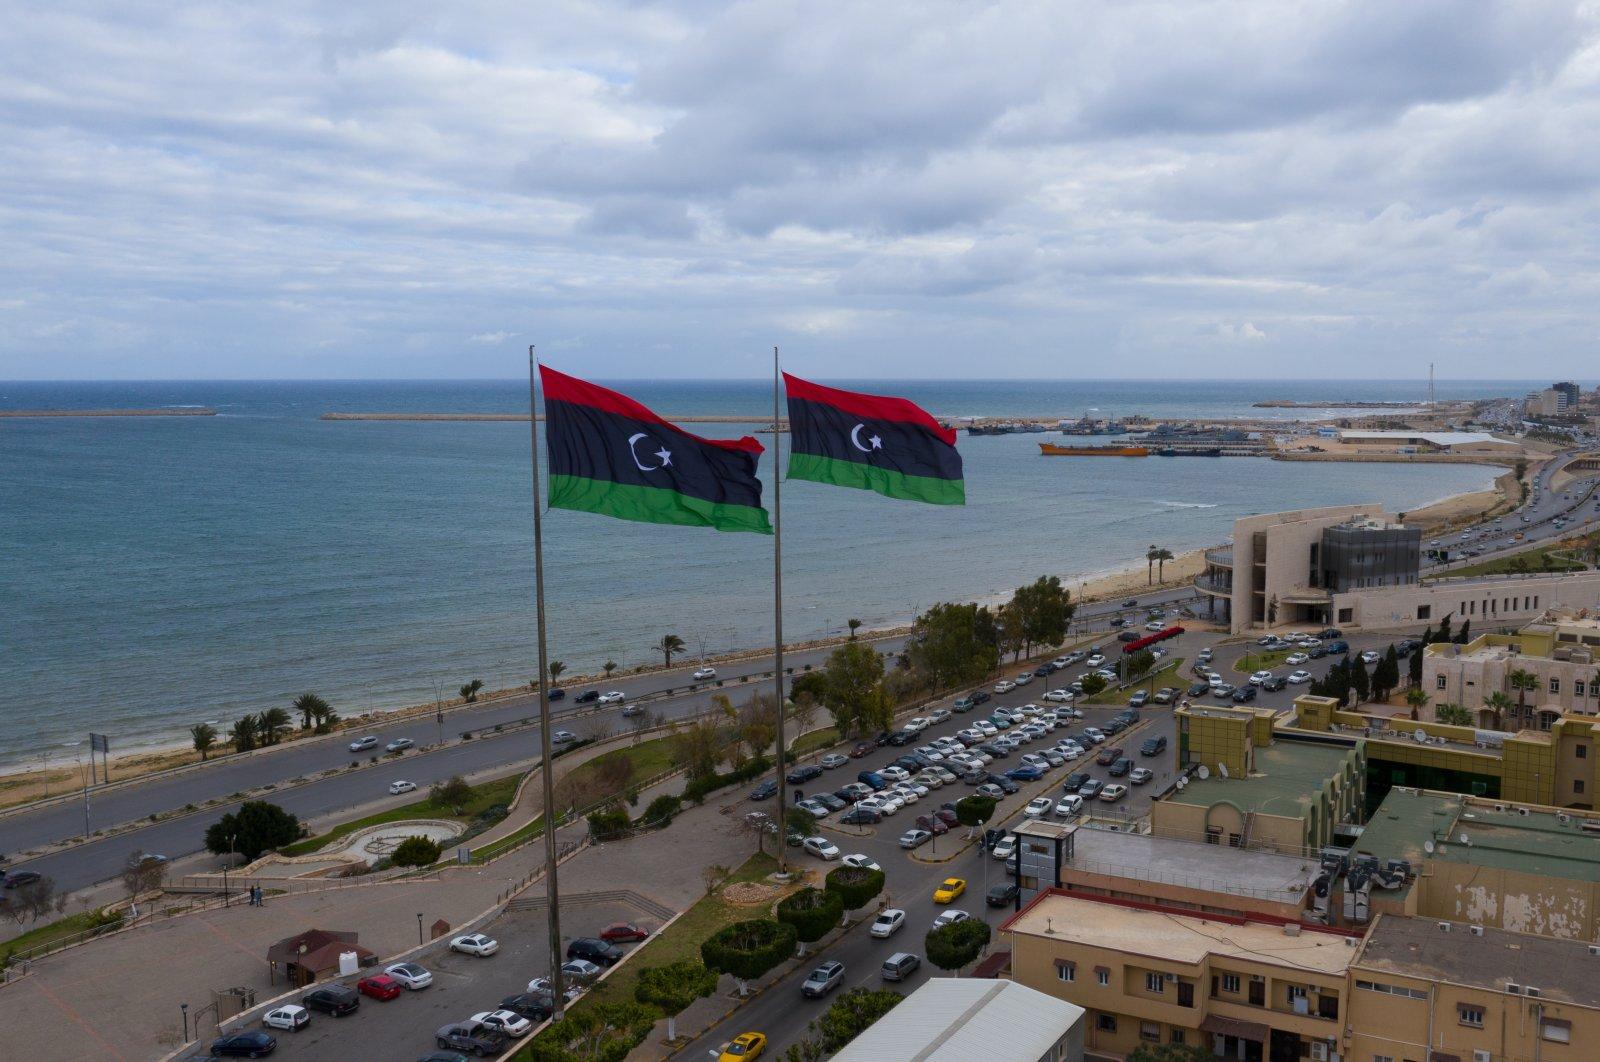 Libyan flags flying over the capital Tripoli, Libya, Feb. 14, 2021. (Shutterstock Photo)